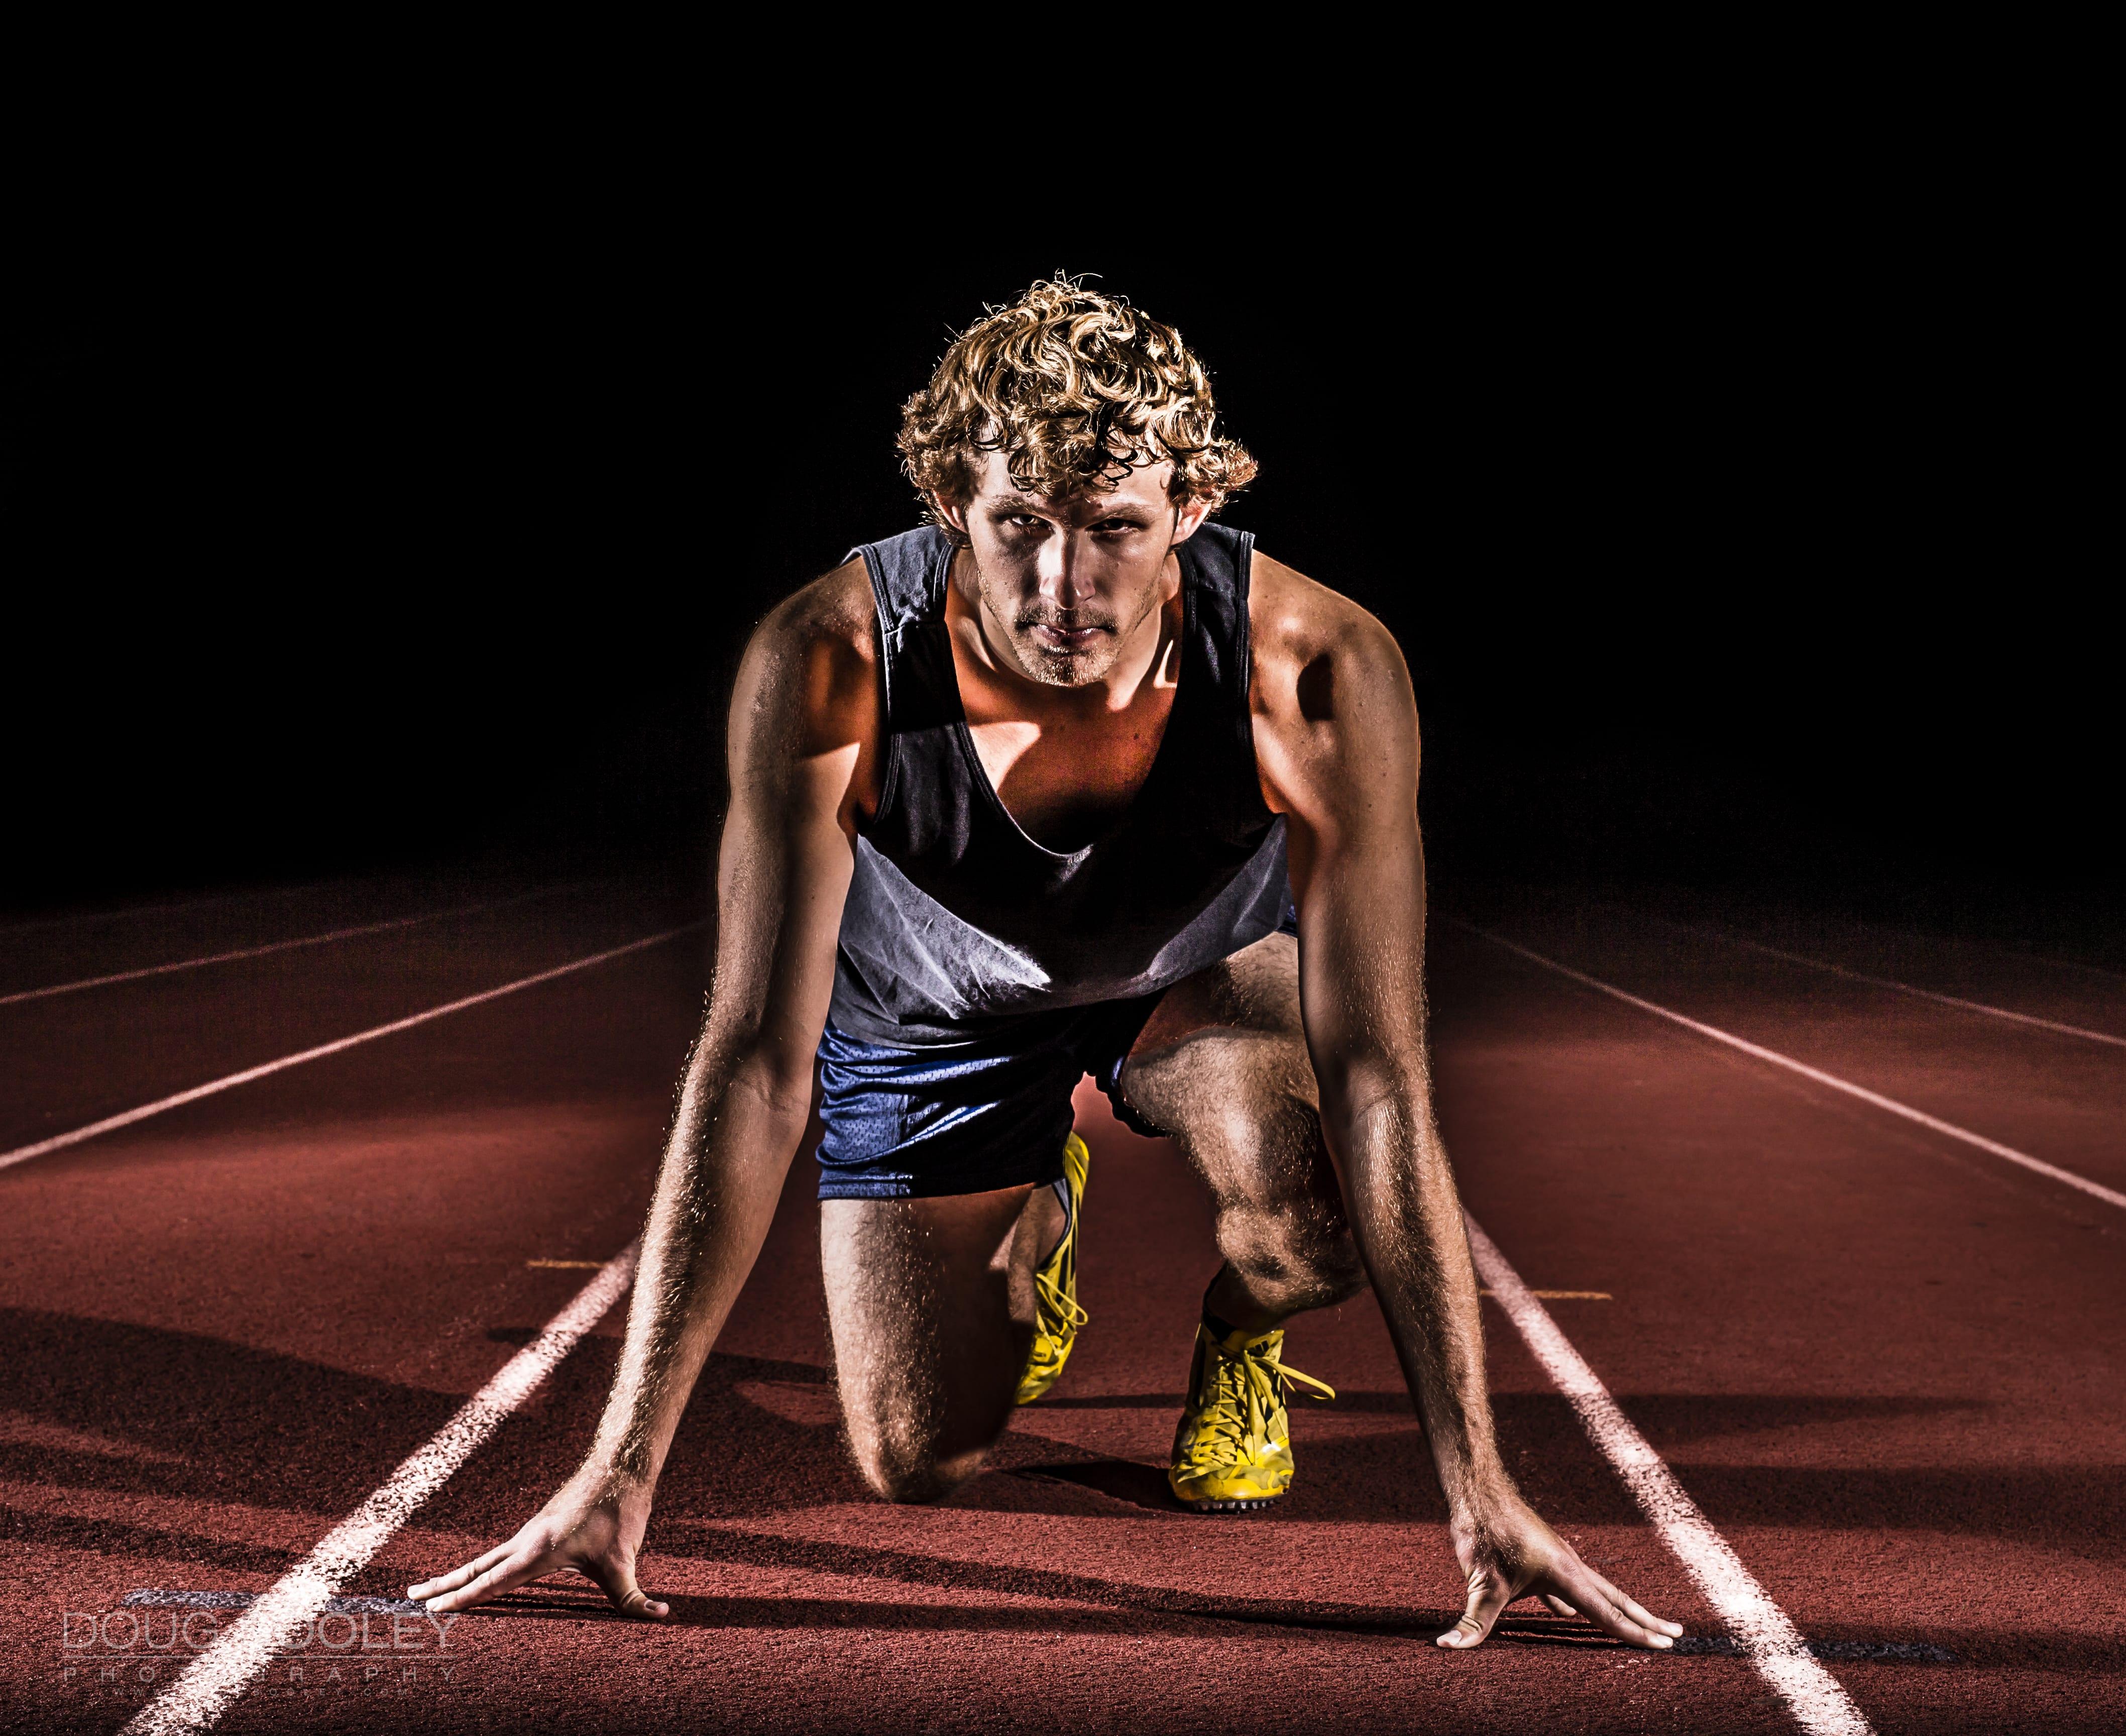 Sports Portrait Shoot Tyler Doug Sooley Photography